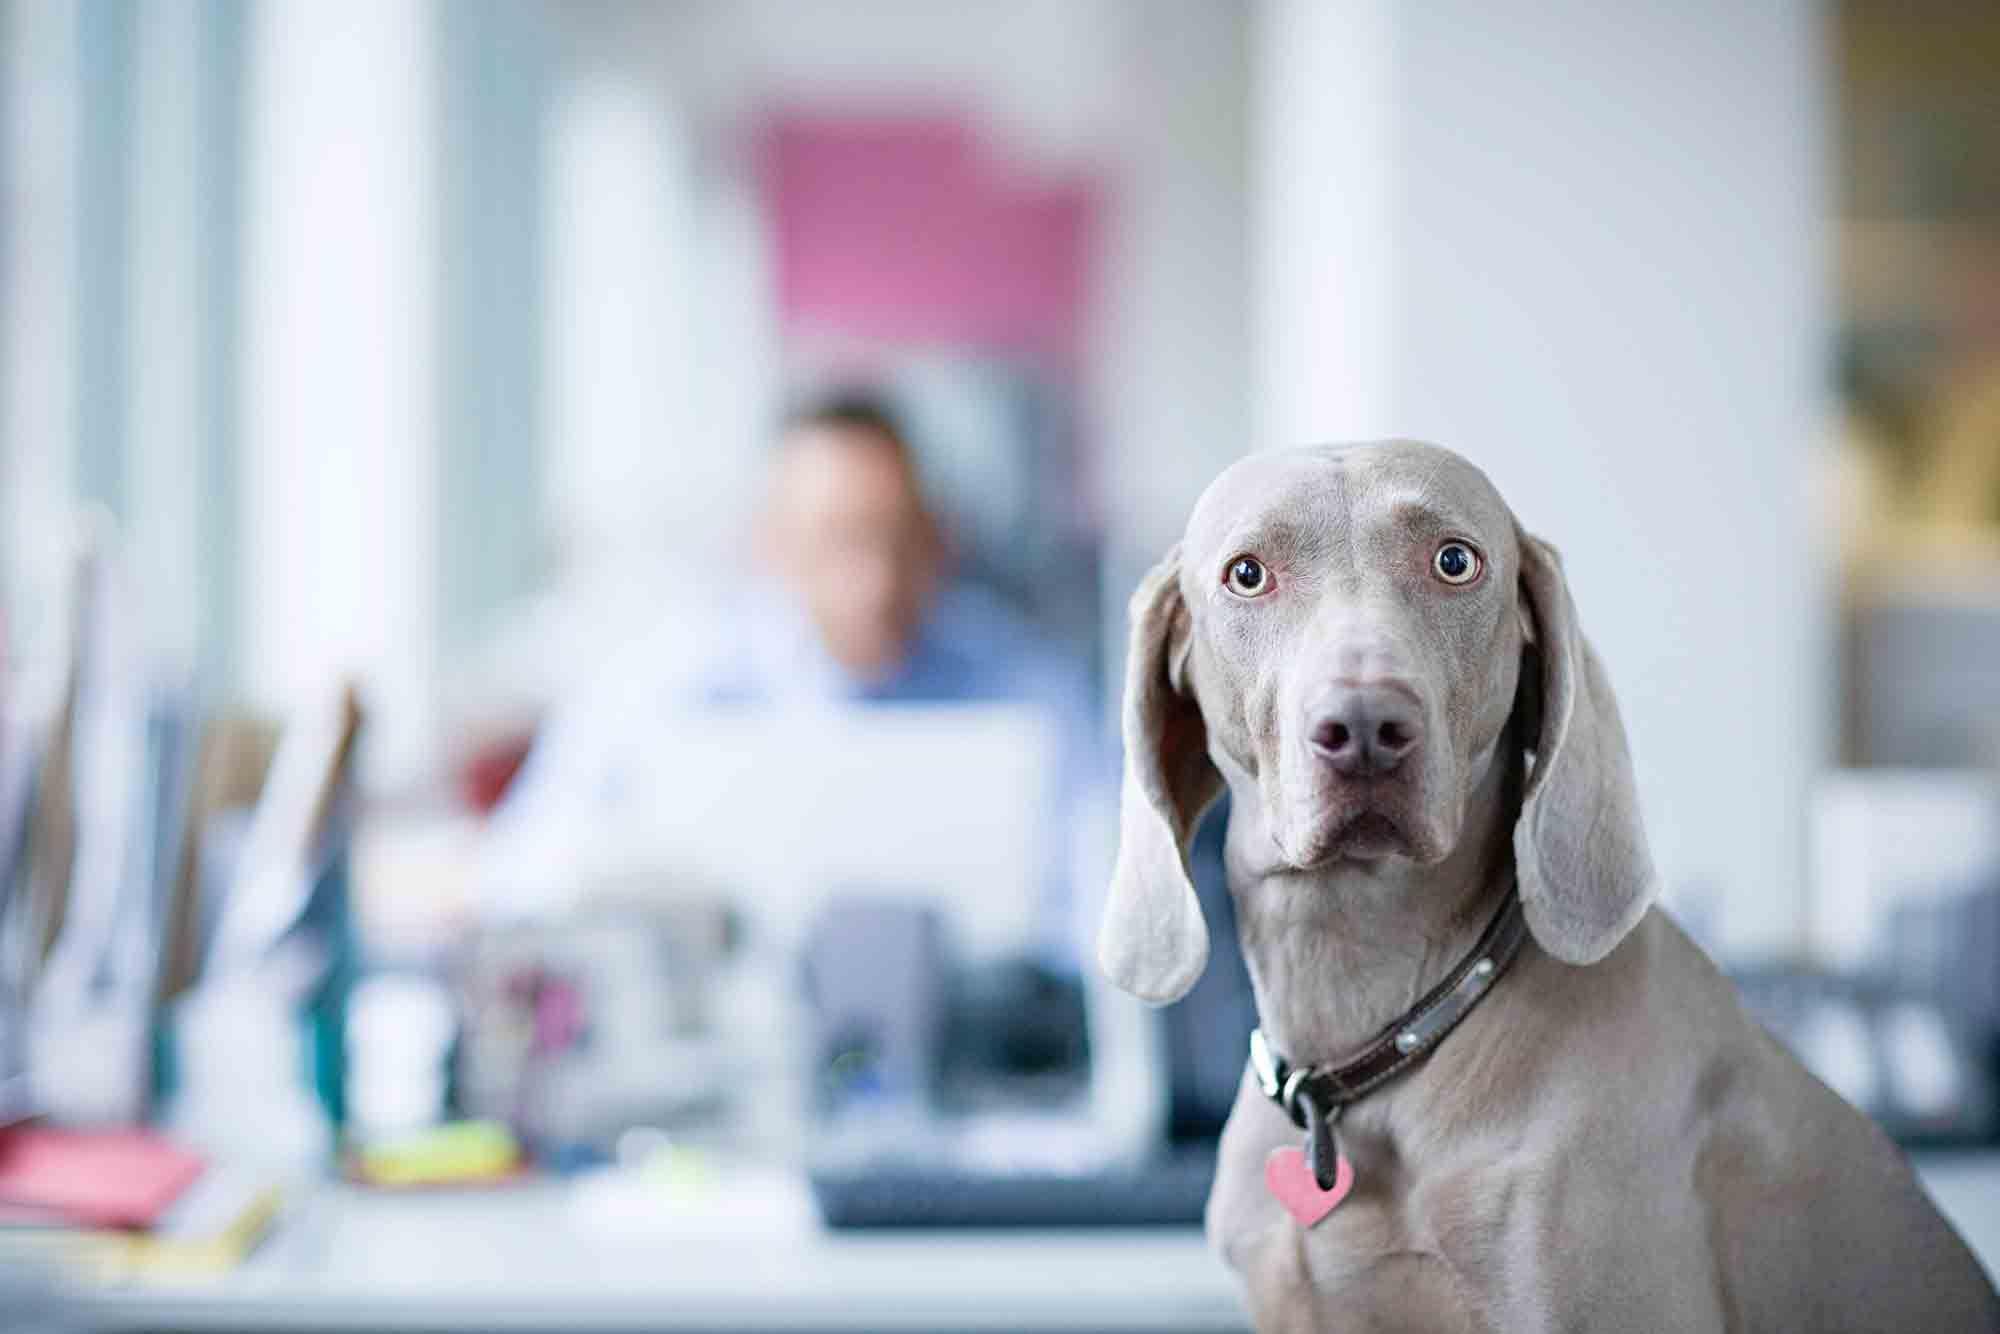 Bloat In Dogs A True Pet Emergency Summeridge Animal Clinic Blog Pet Emergency Pet Blog Dog Adoption